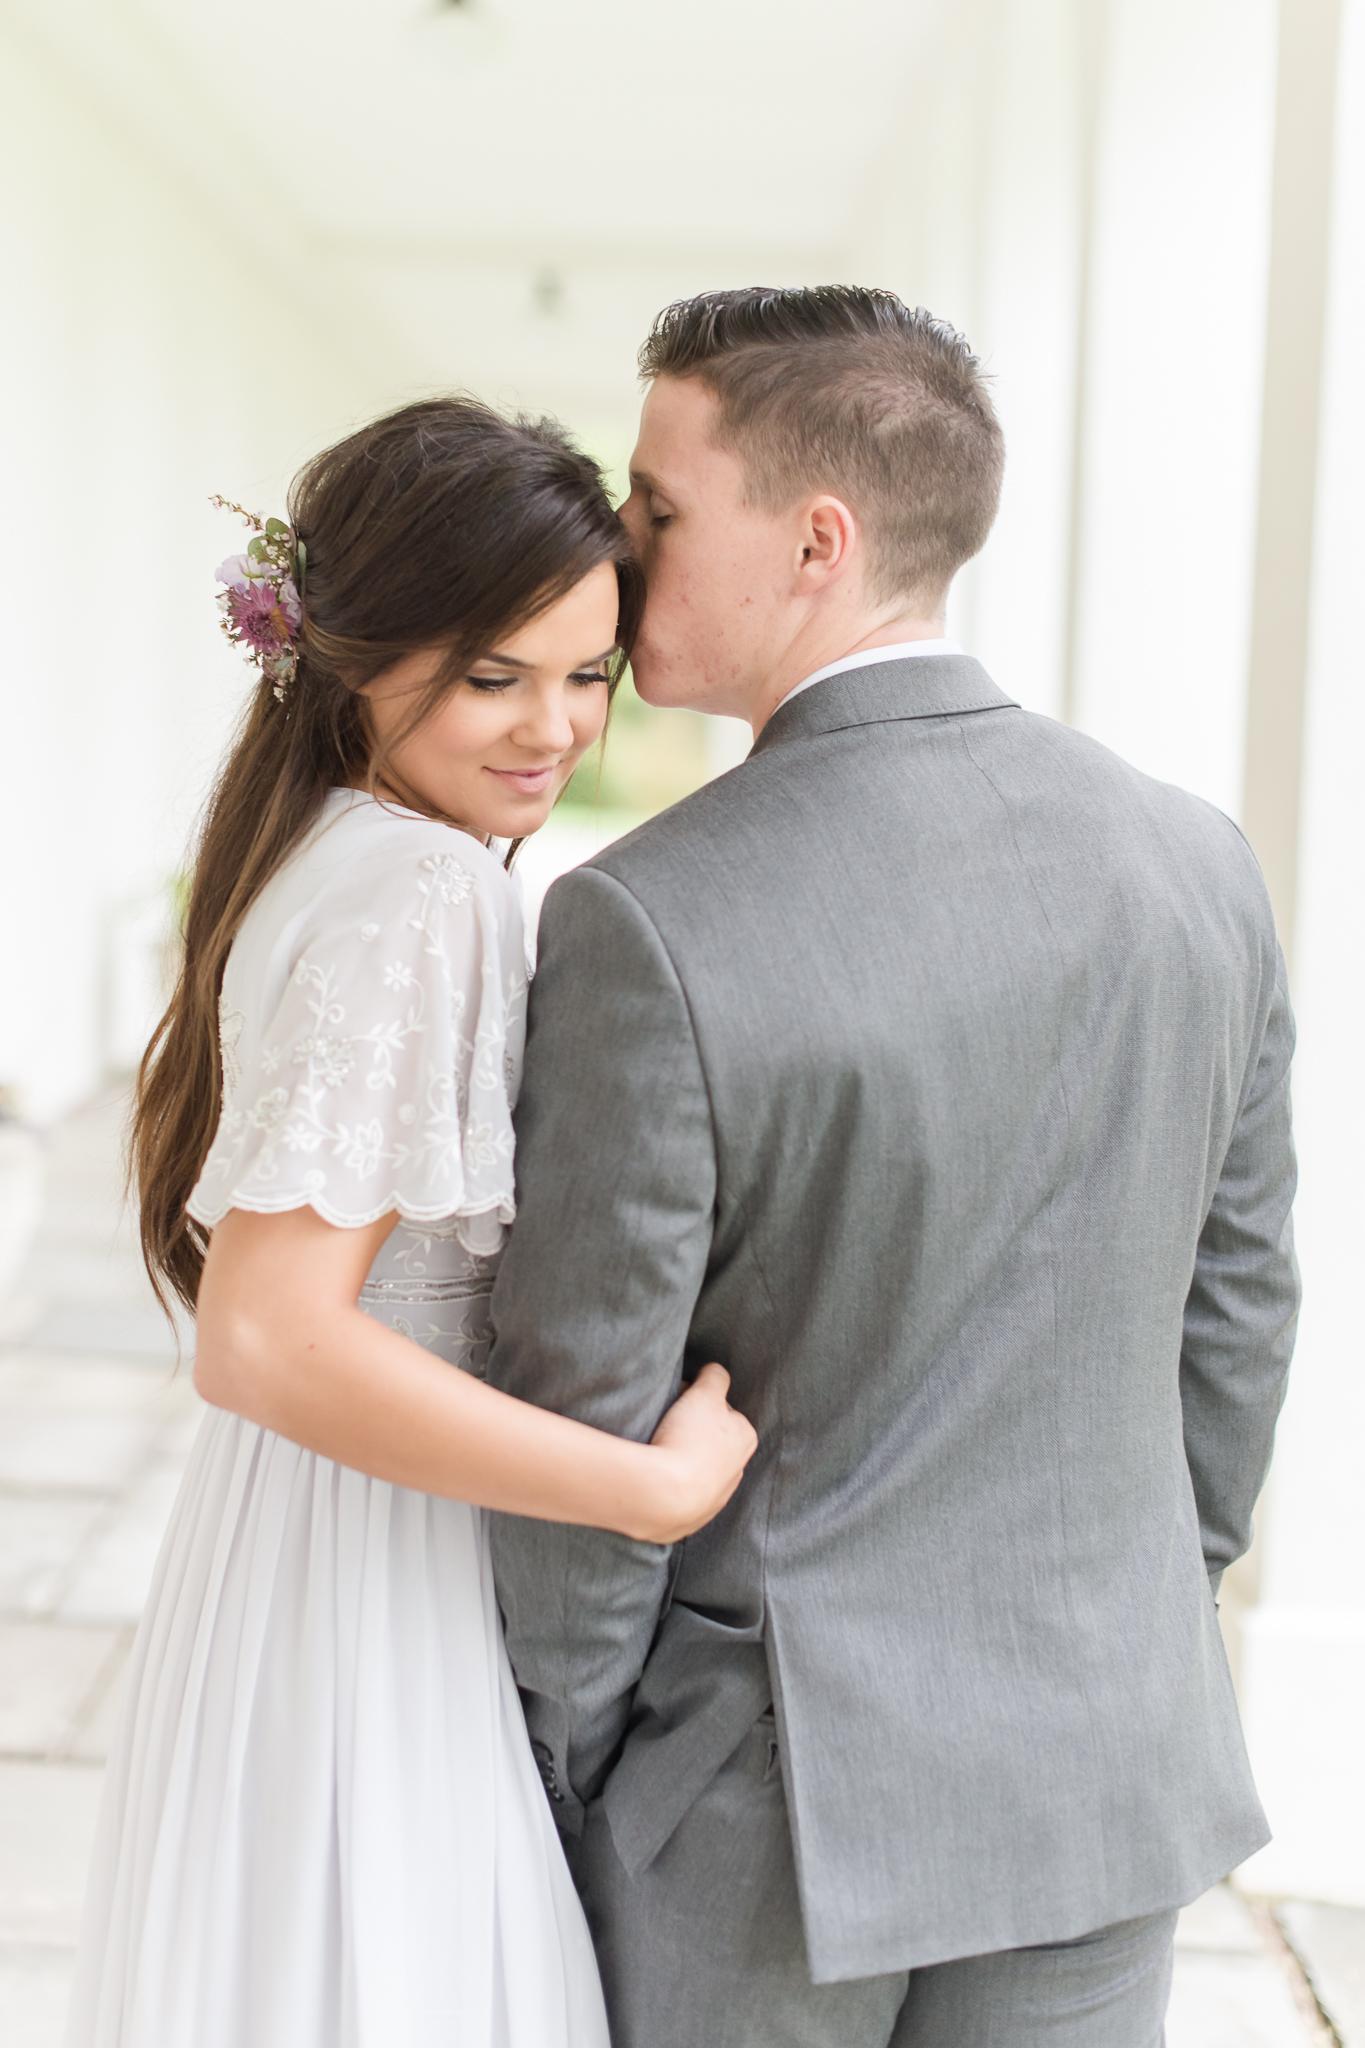 Newfields Engagement Session IMA Indianapolis Museum of Art Wedding Photos Photographer-57.jpg